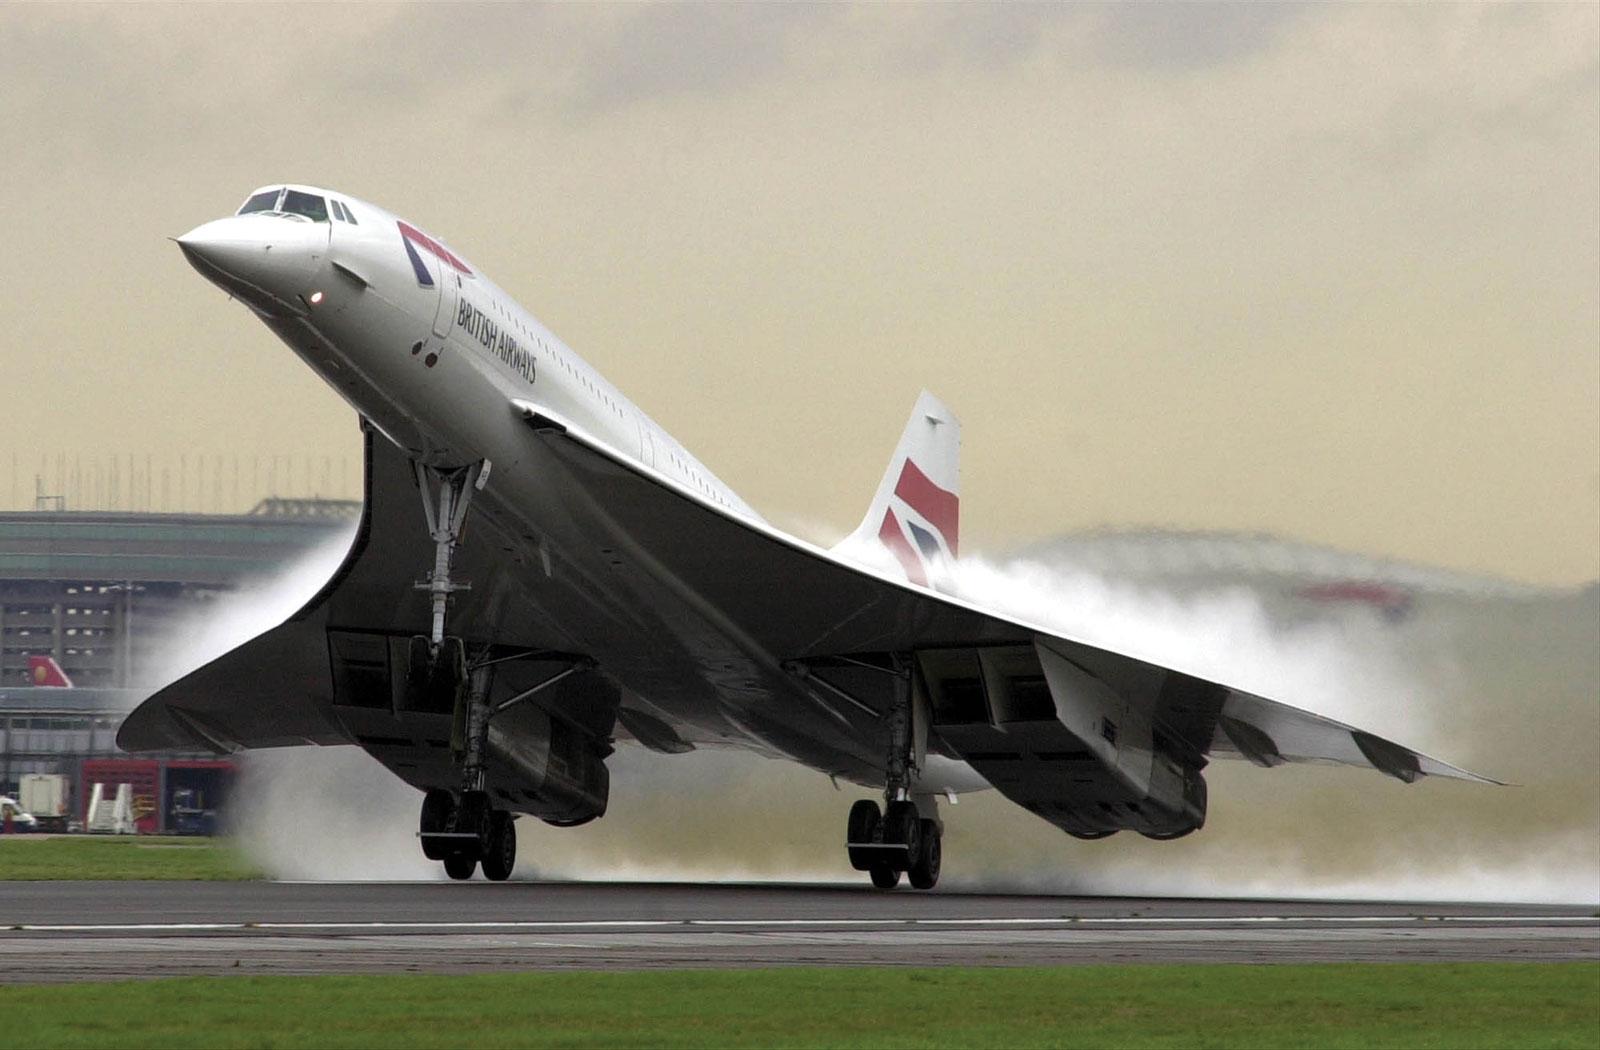 Flight of the Concorde